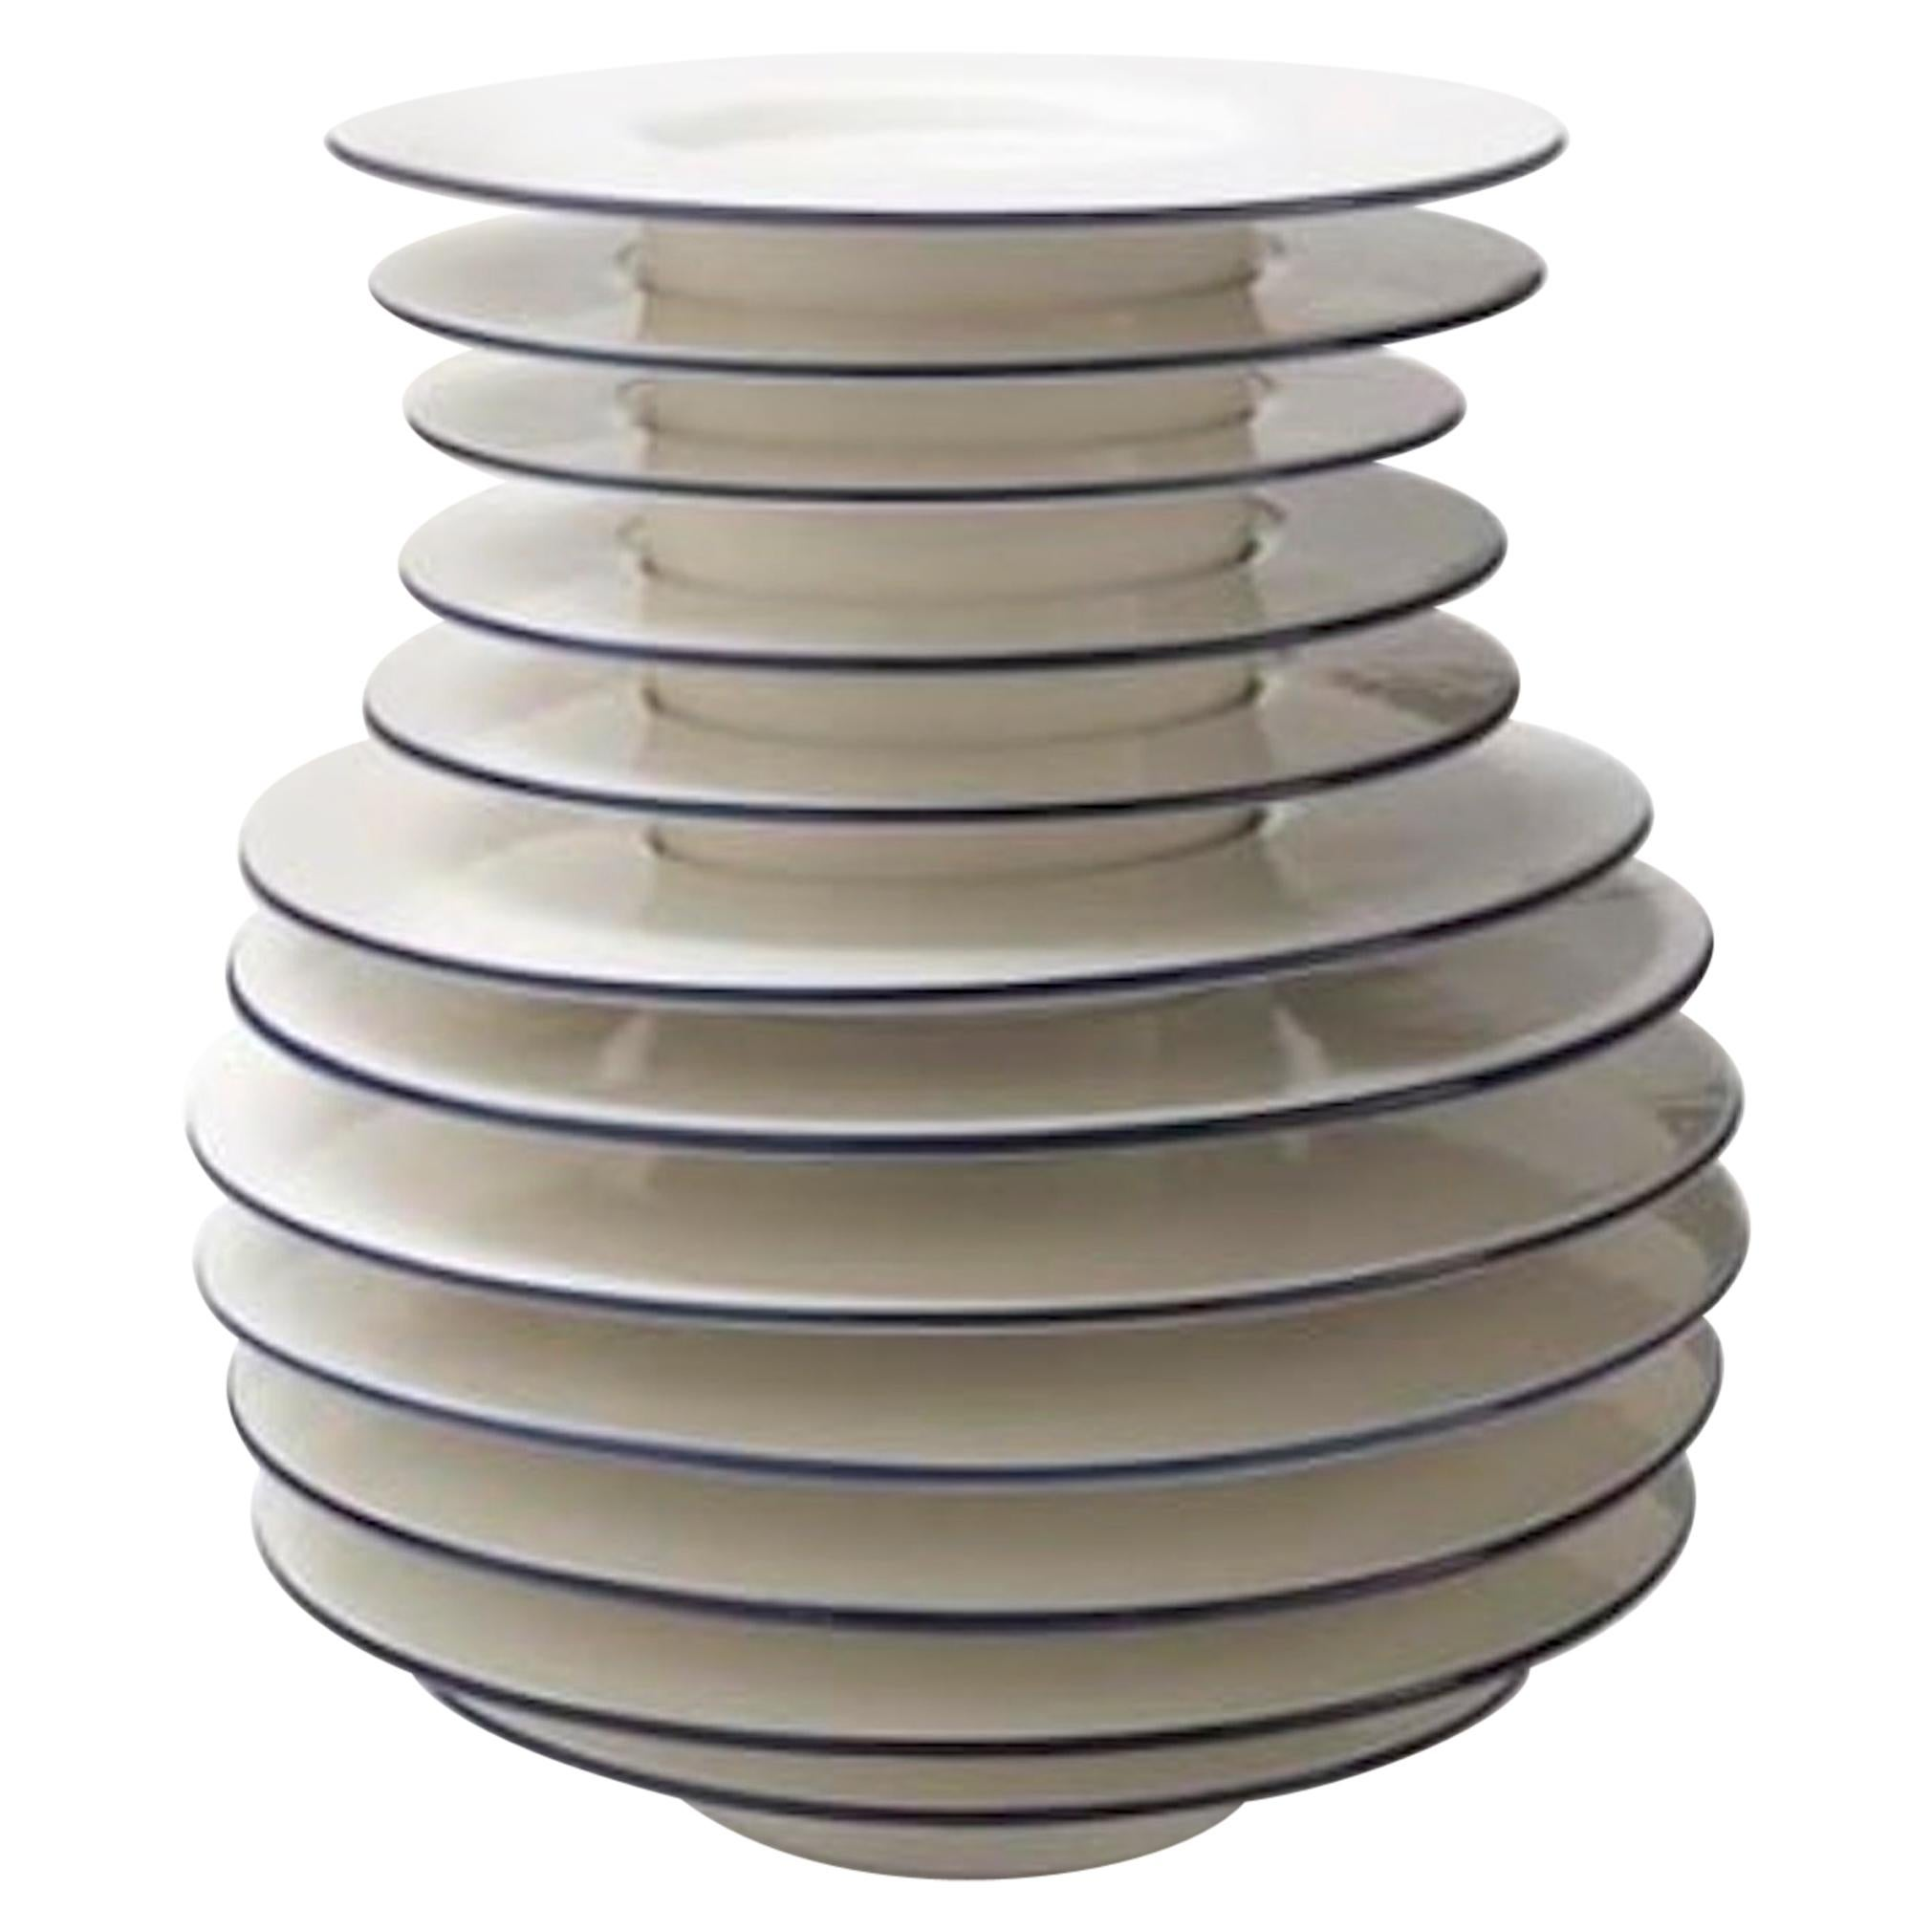 Andrea Branzi Italian Ceramic Sculpture Model Pila Superego Editions